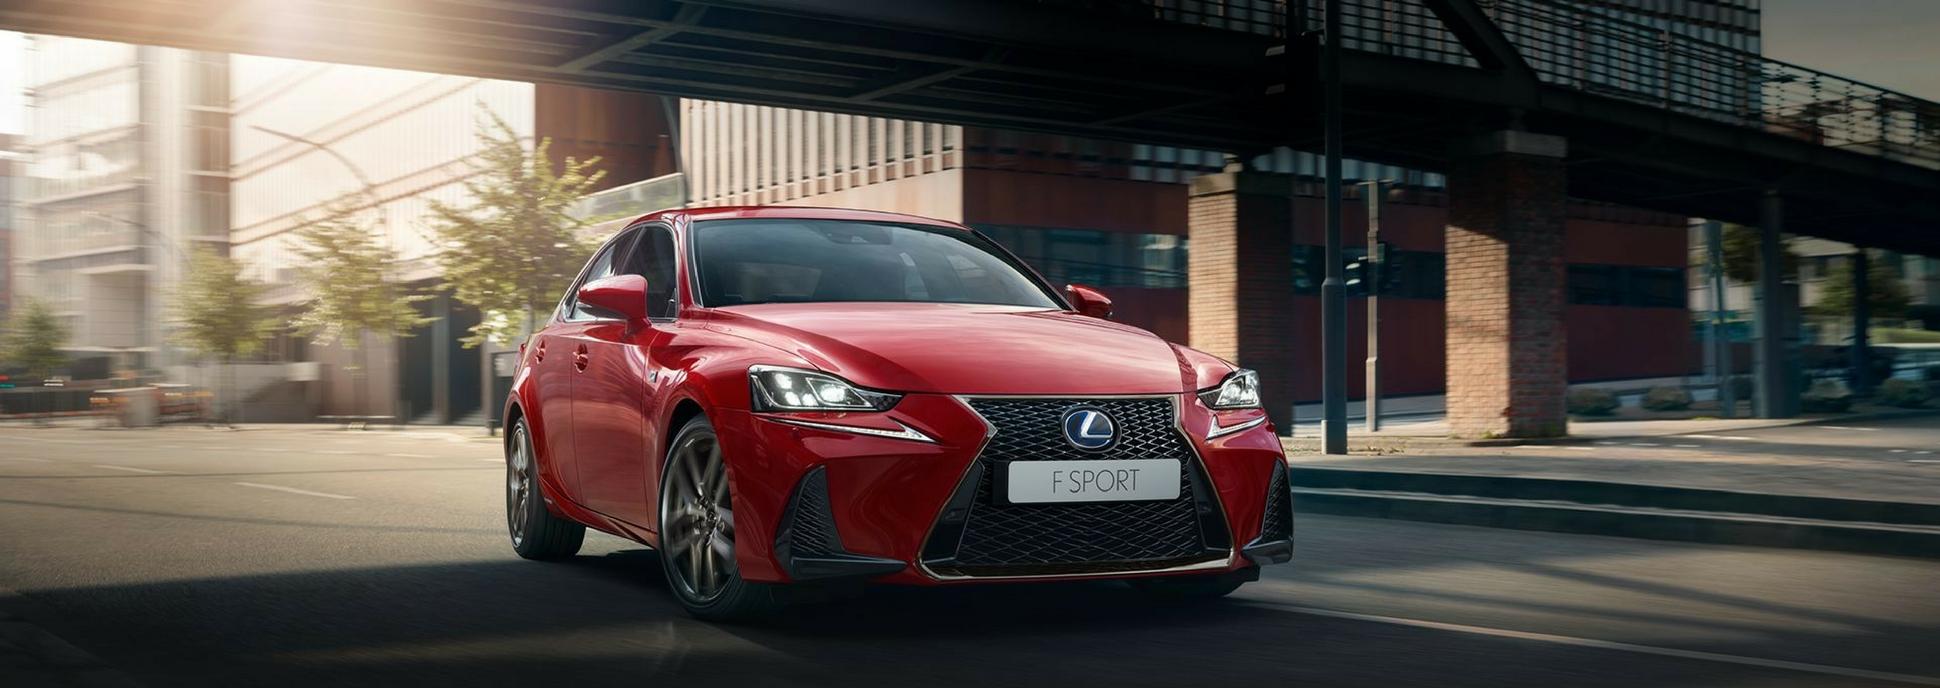 Lexus IS F Sport Hybrid punainen